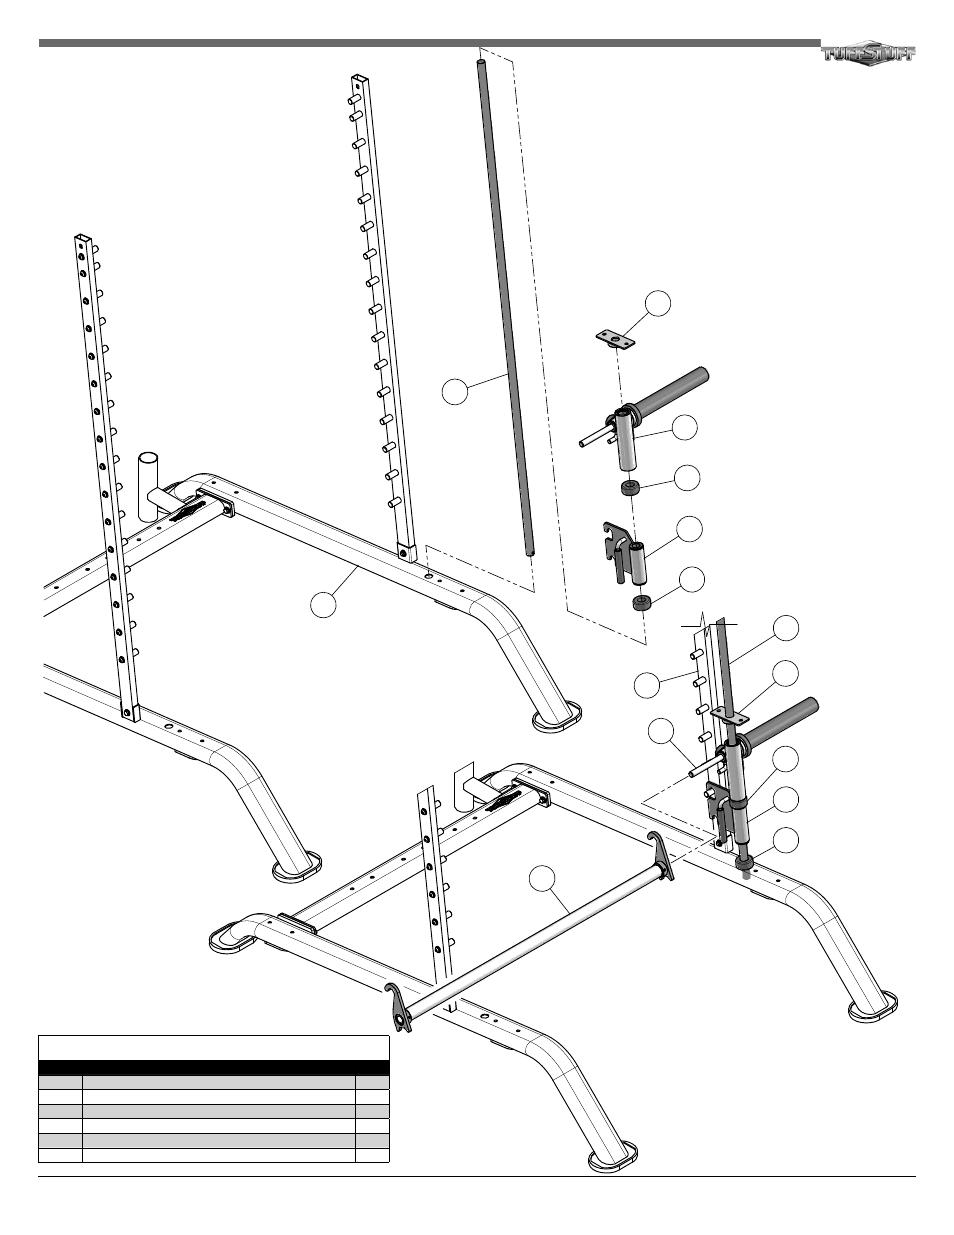 Tuff Stuff RSM-625WS Smith-Half Cage Ensemble User Manual